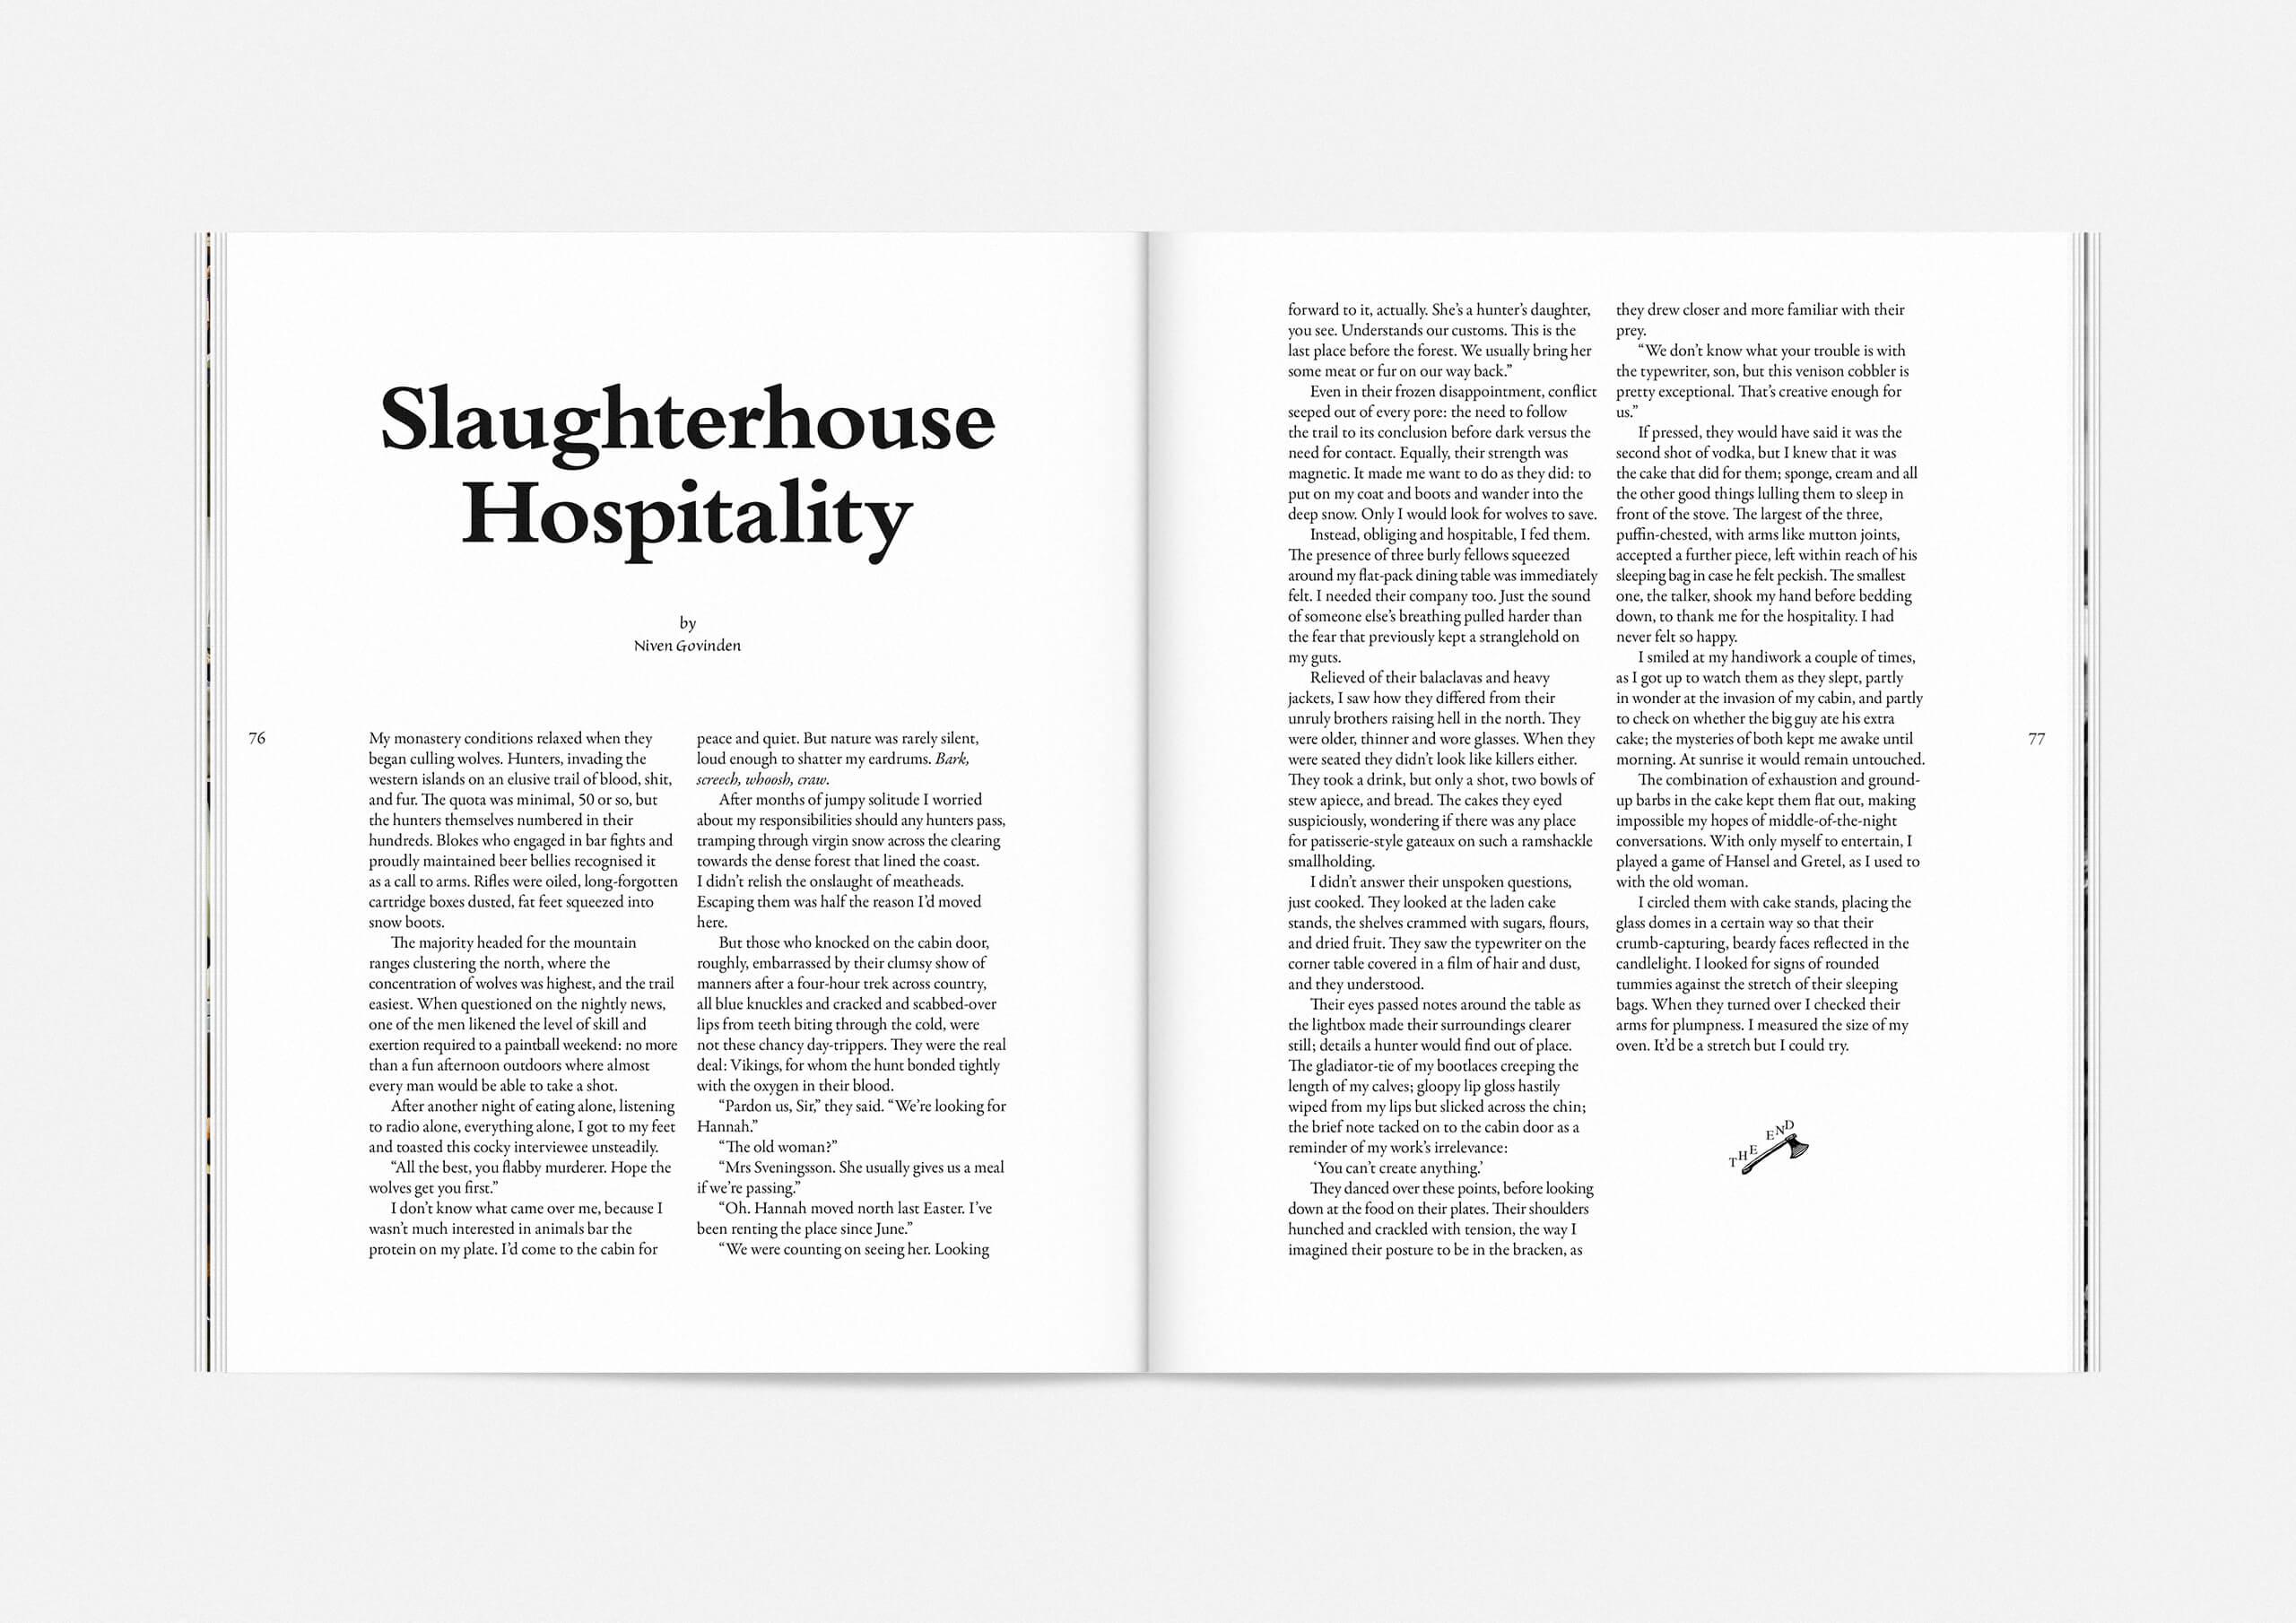 https://neuegestaltung.de/media/pages/clients/teller-magazine-issue-2/eaf88a2739-1597415083/teller_issue_02_innenseite_76_77_ng.jpg